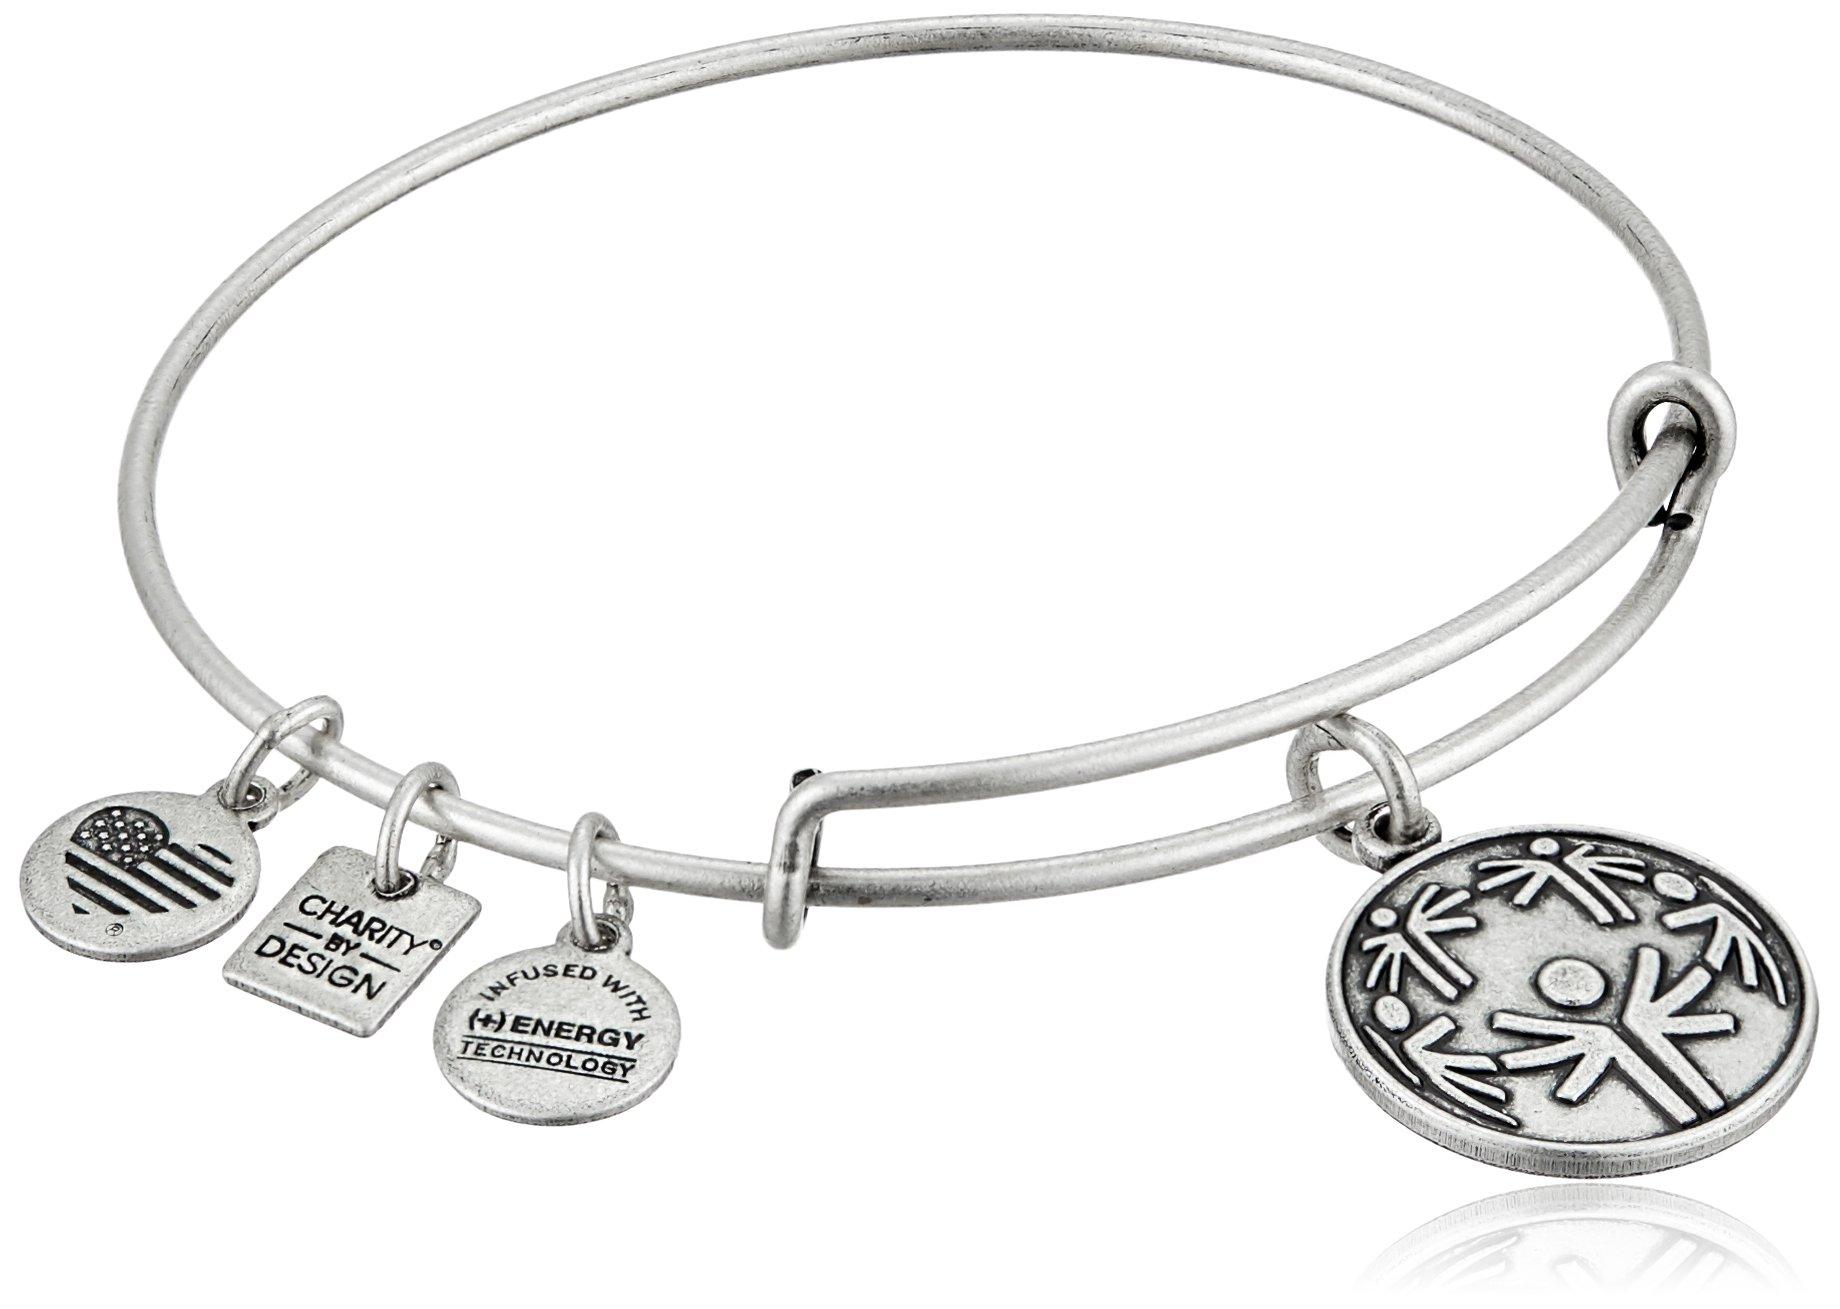 Alex and Ani Charity By Design Power of Unity Rafaelian Silver Bangle Bracelet